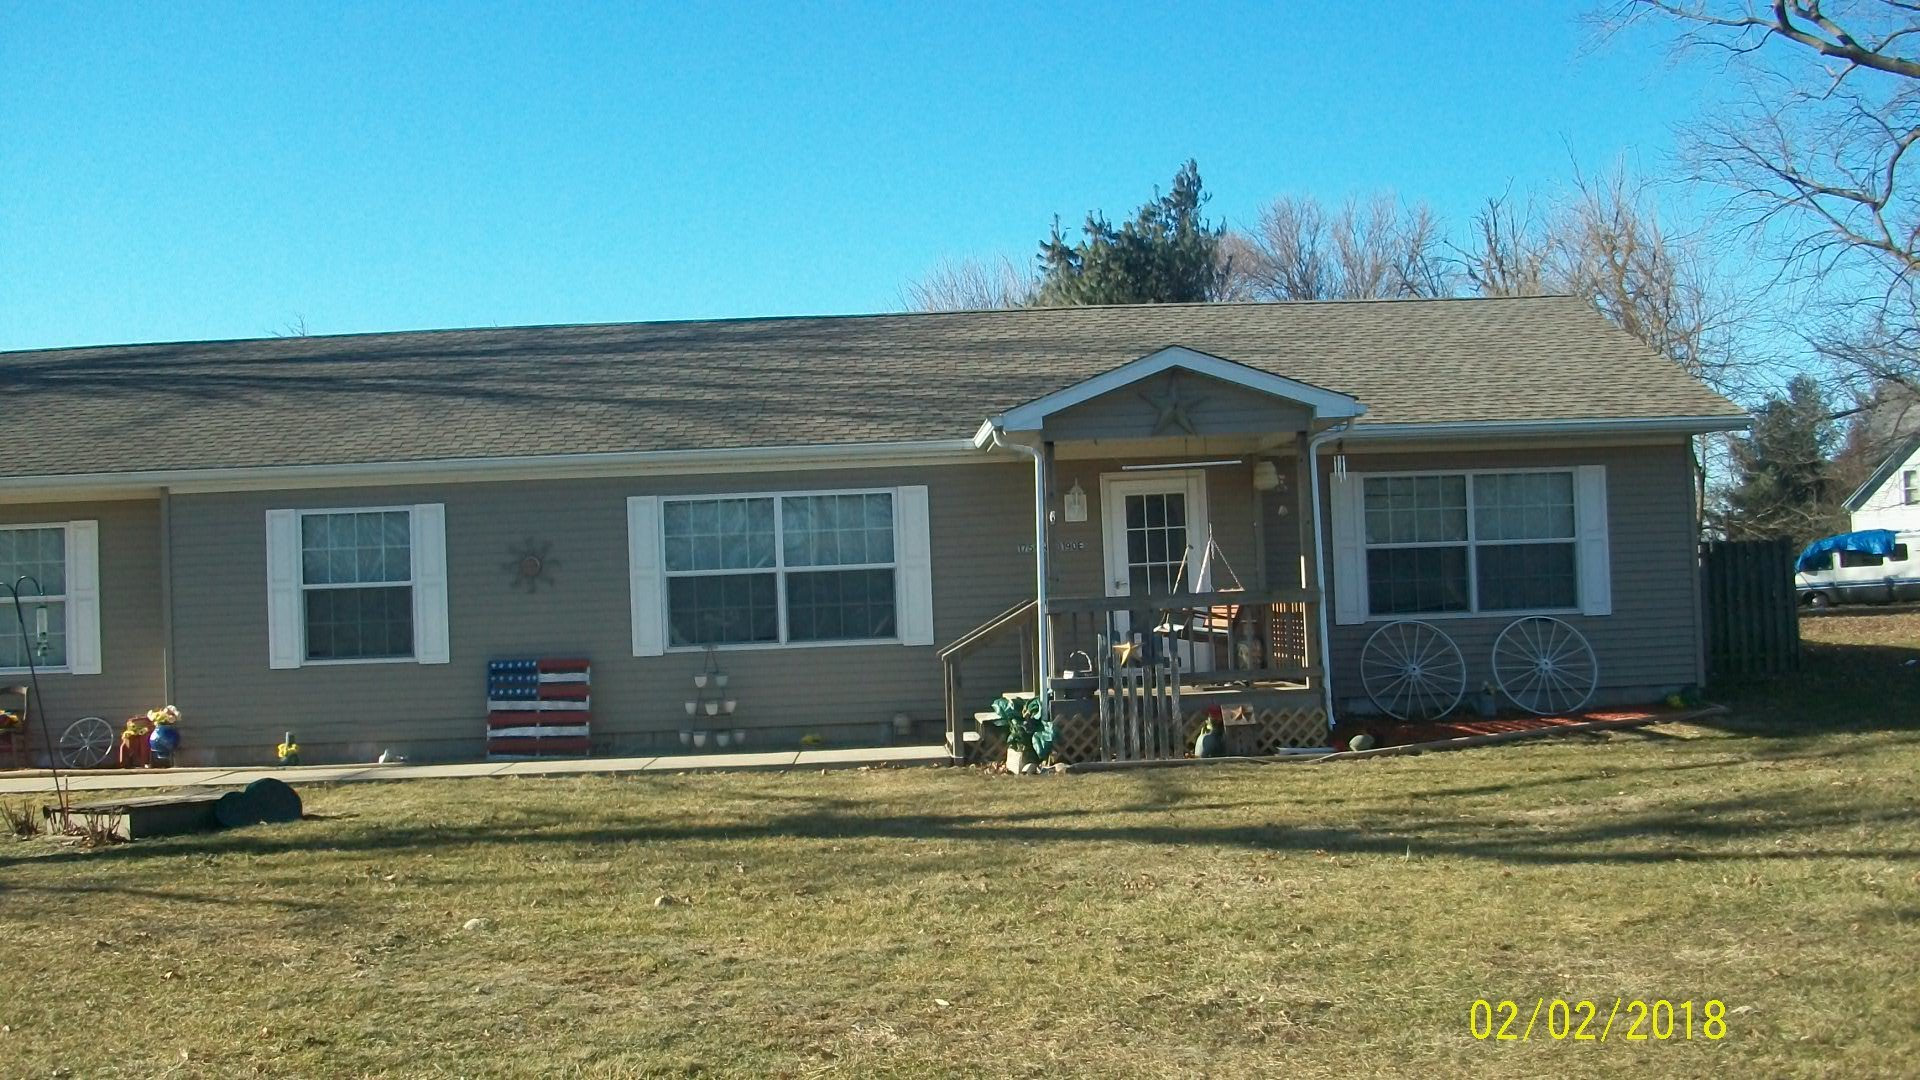 1759 North 3190 East, Sheldon, Illinois, 60966